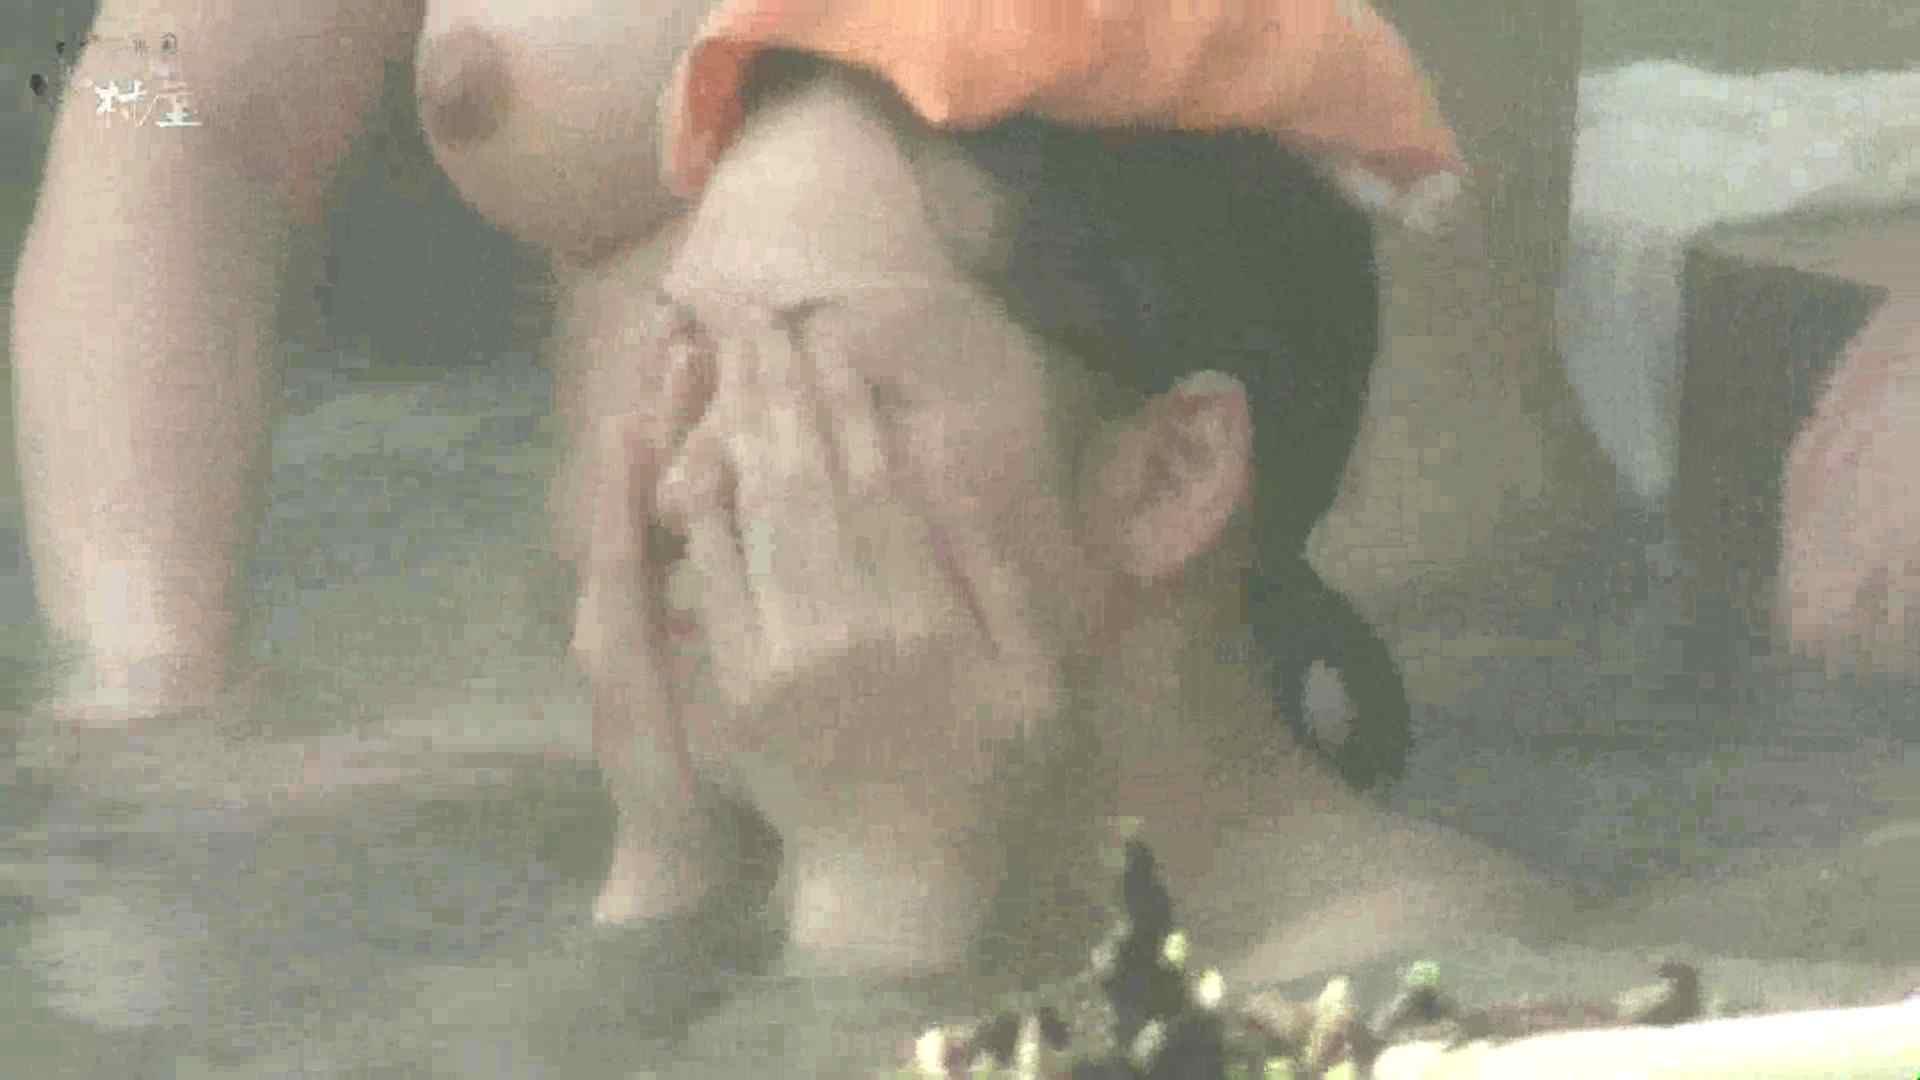 Aquaな露天風呂Vol.872潜入盗撮露天風呂八判湯 其の六 盗撮シリーズ  102PIX 15